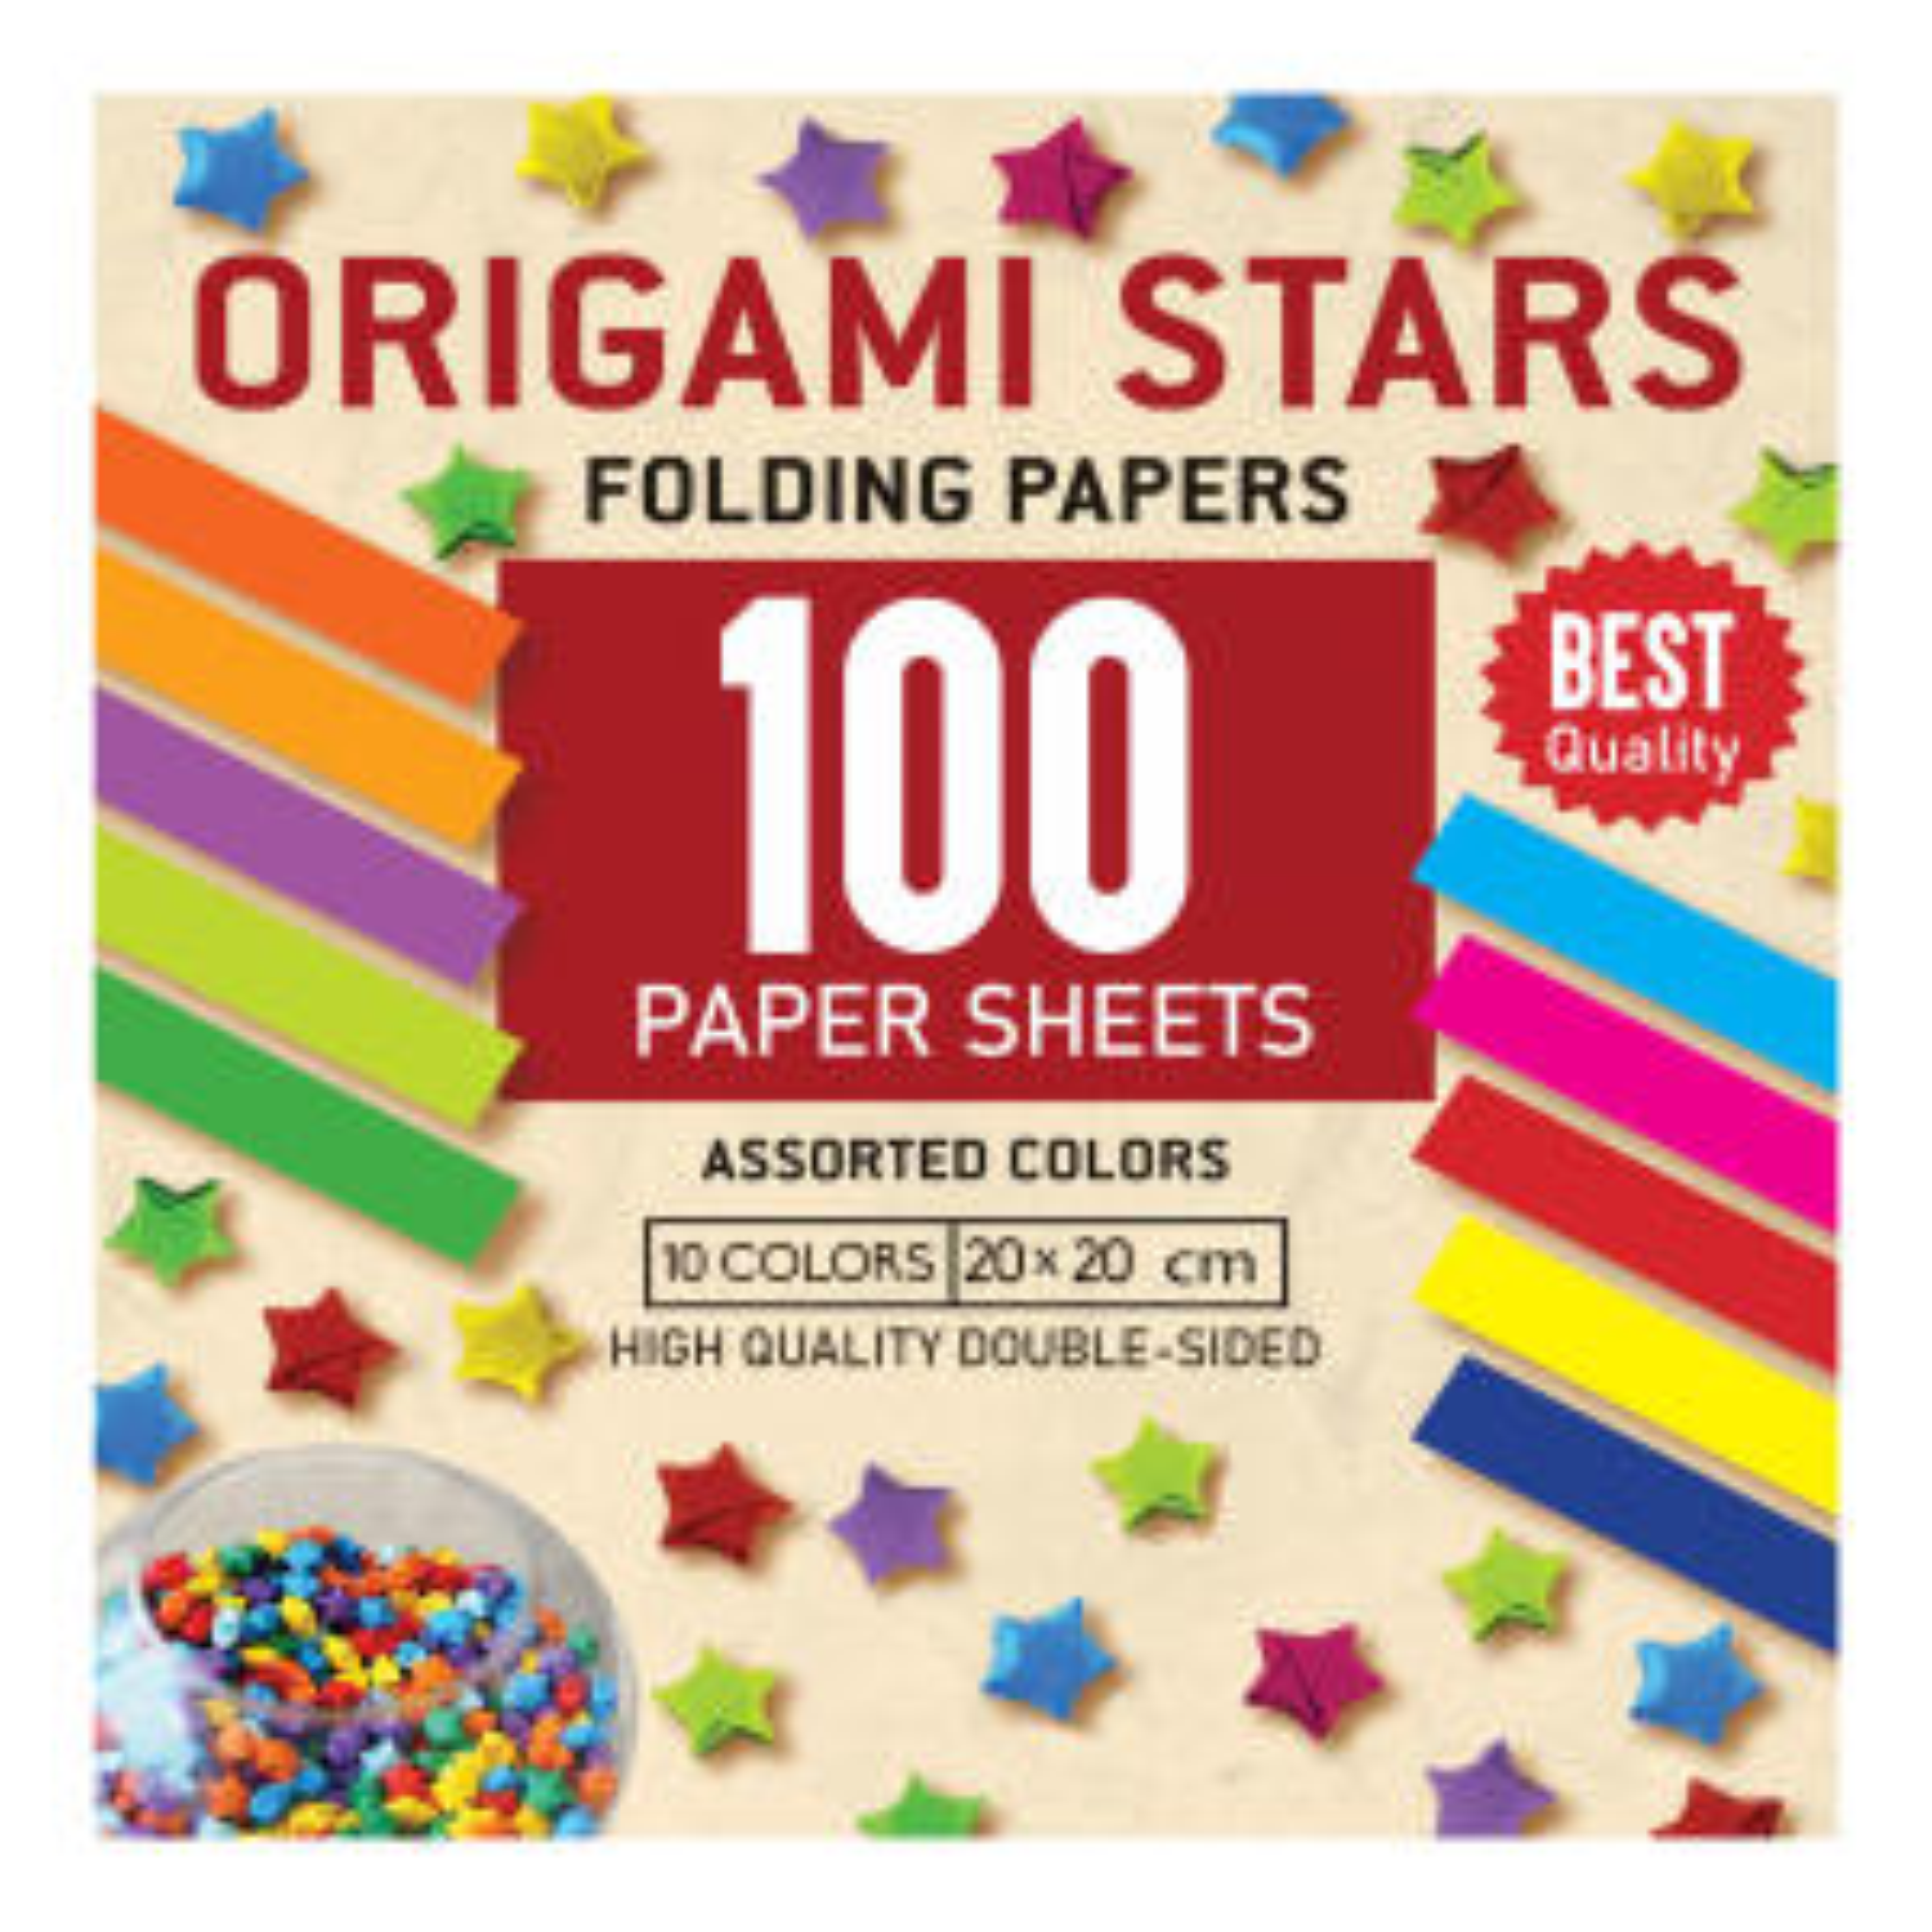 کاغذ اوریگامی استار کد 2020 بسته 100 عددی